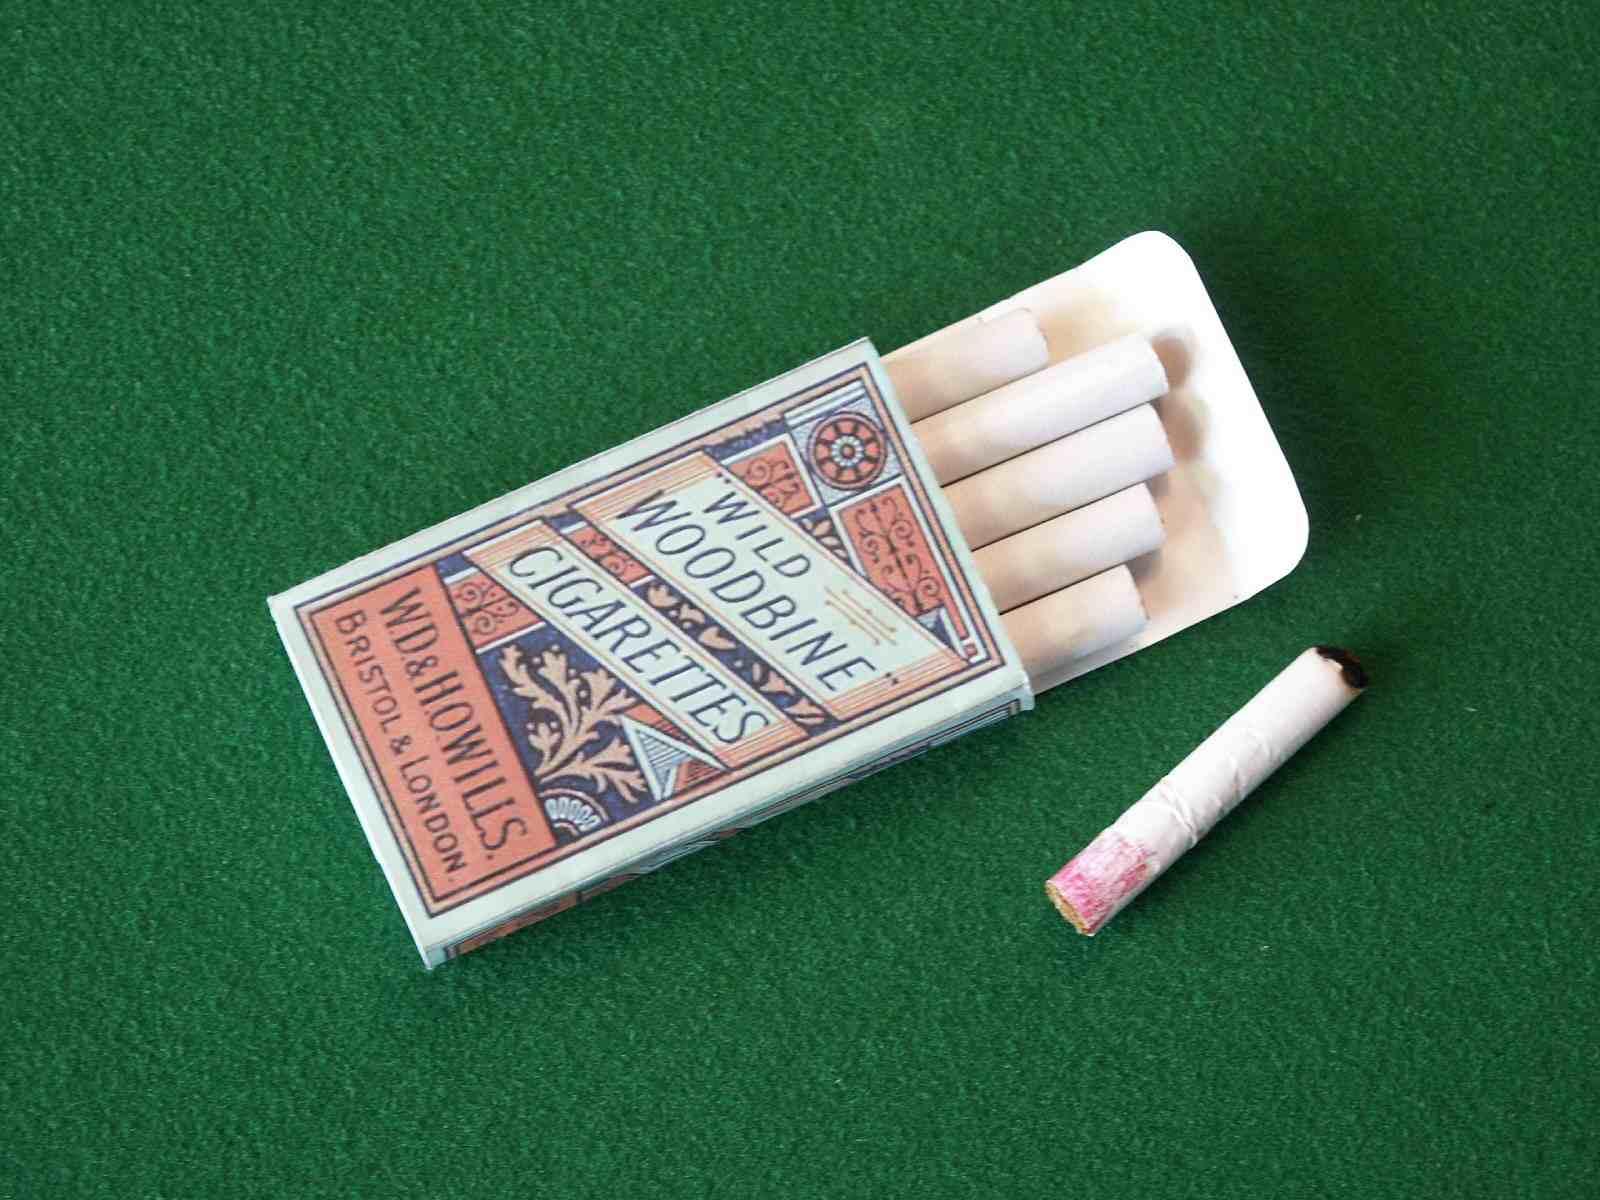 Arizona carton of cigarettes Marlboro